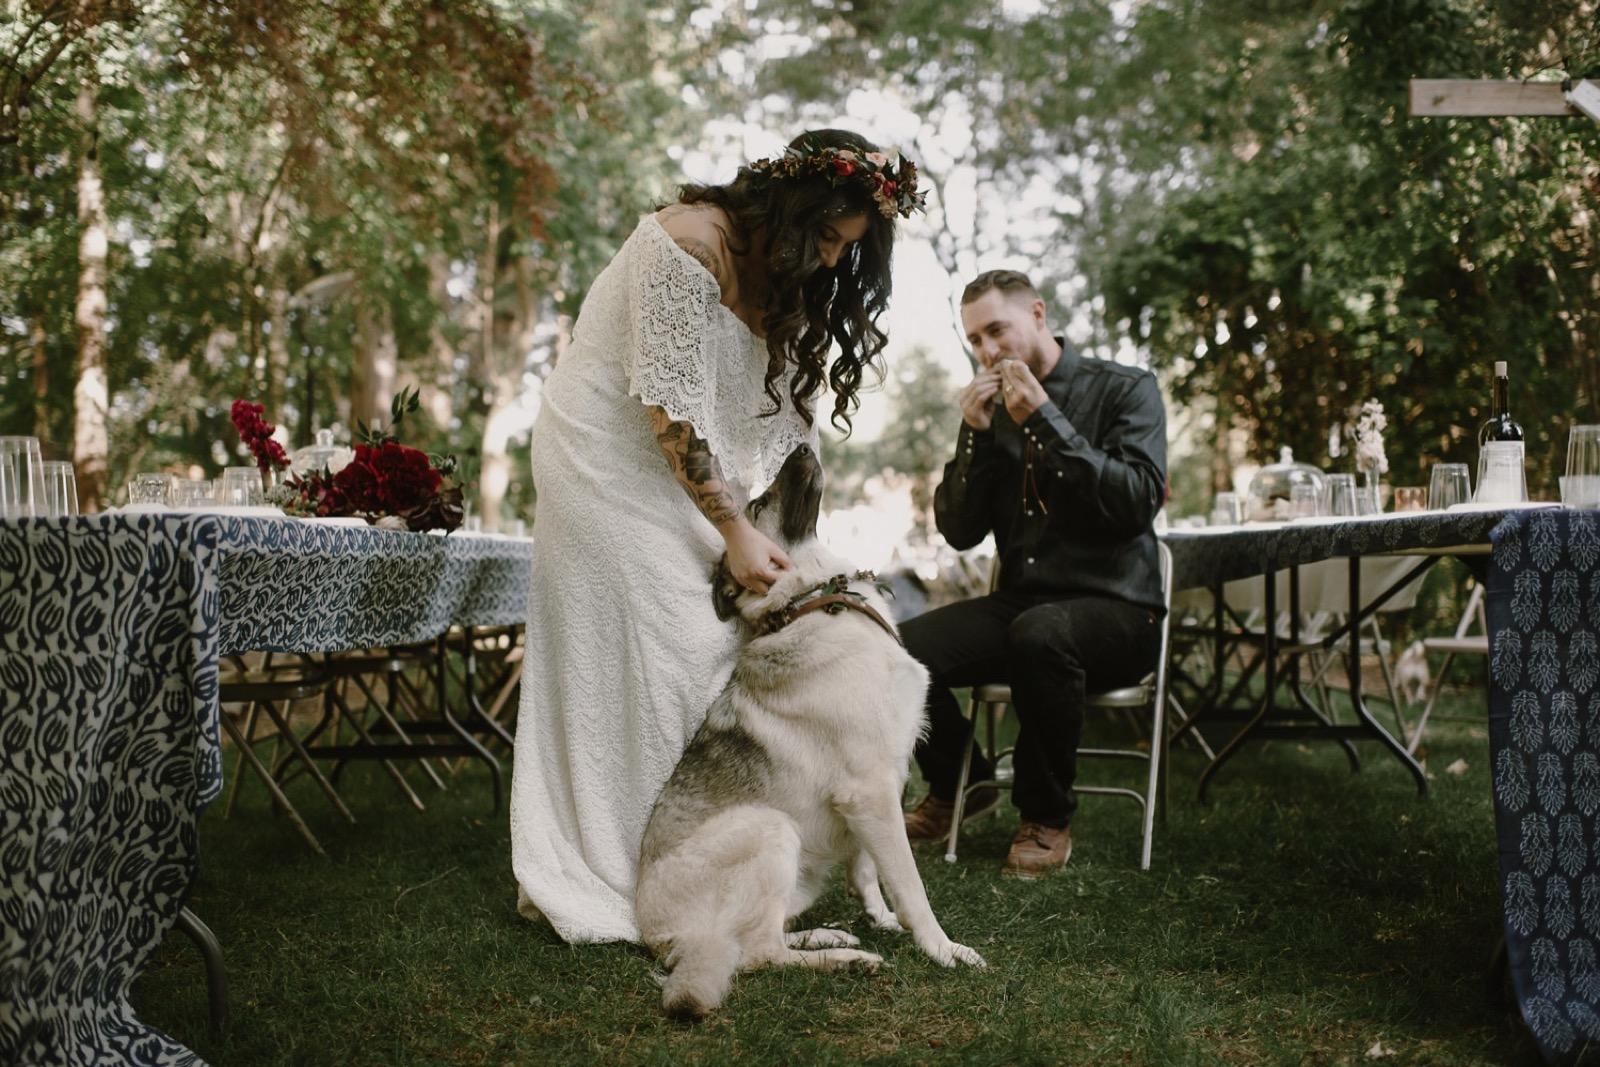 077_California_Ranch_Wedding193.jpg